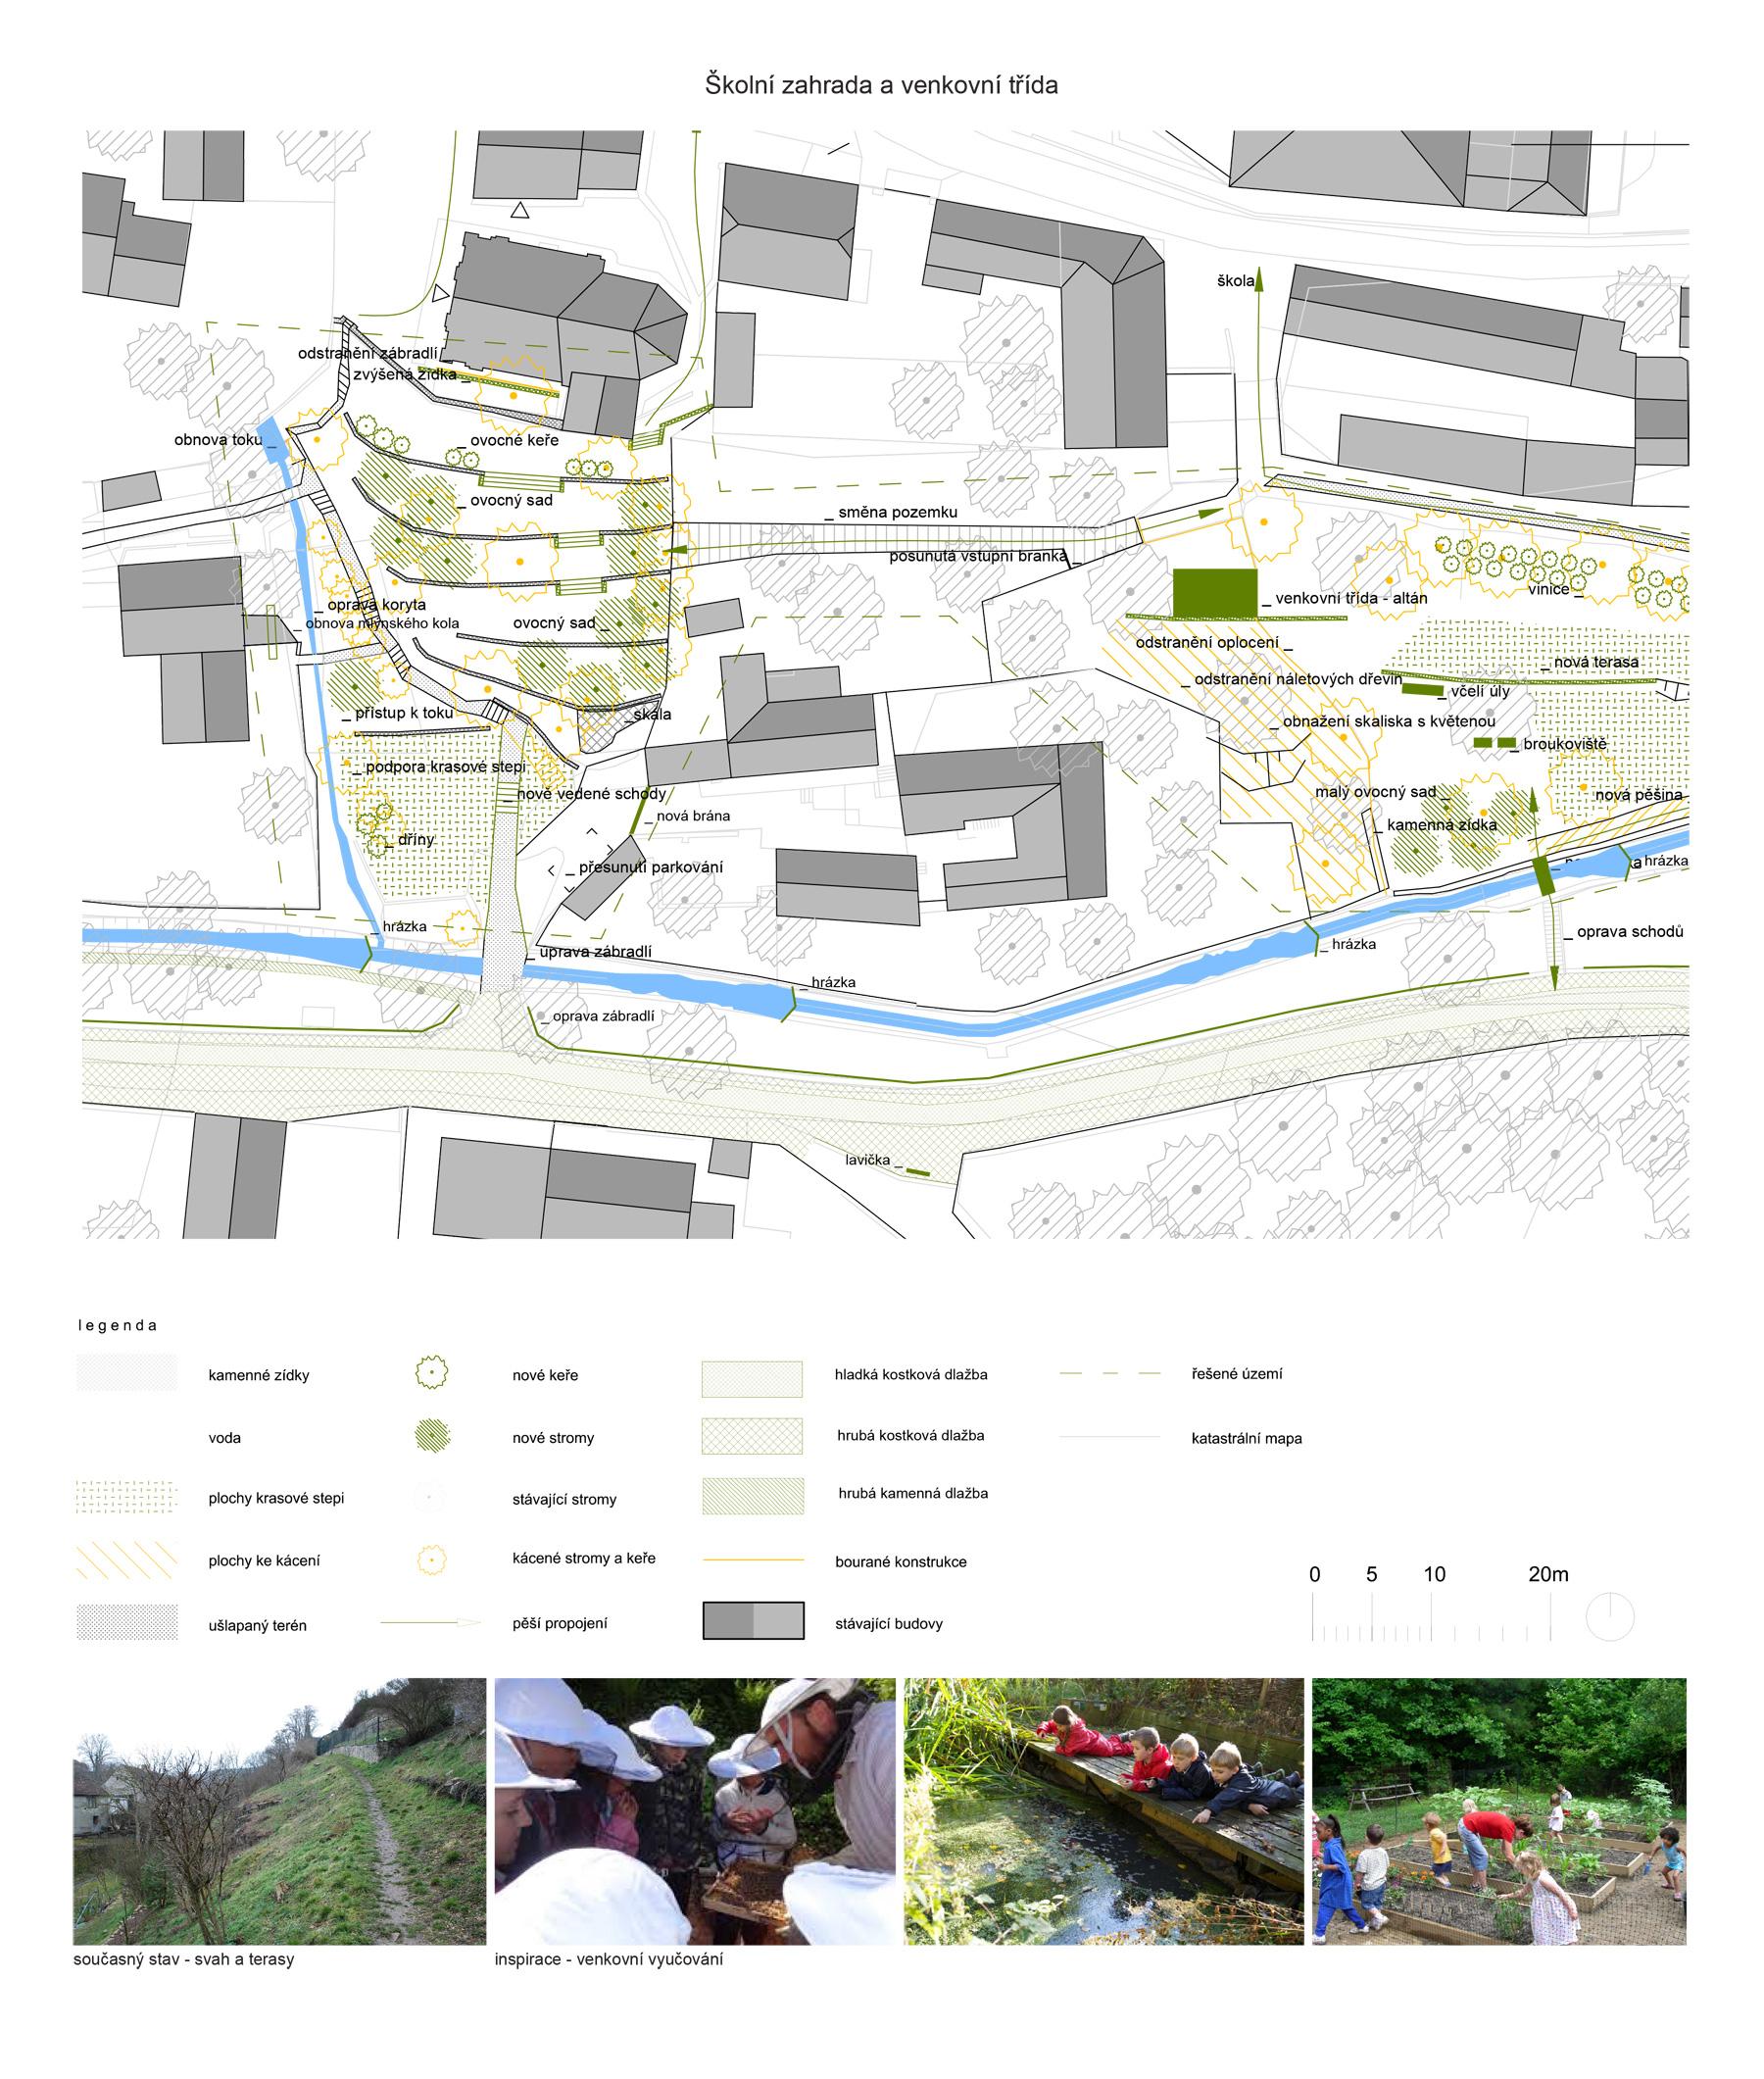 http://tetin.cityupgrade.cz/vize/06_skolni-zahrada-1.jpg